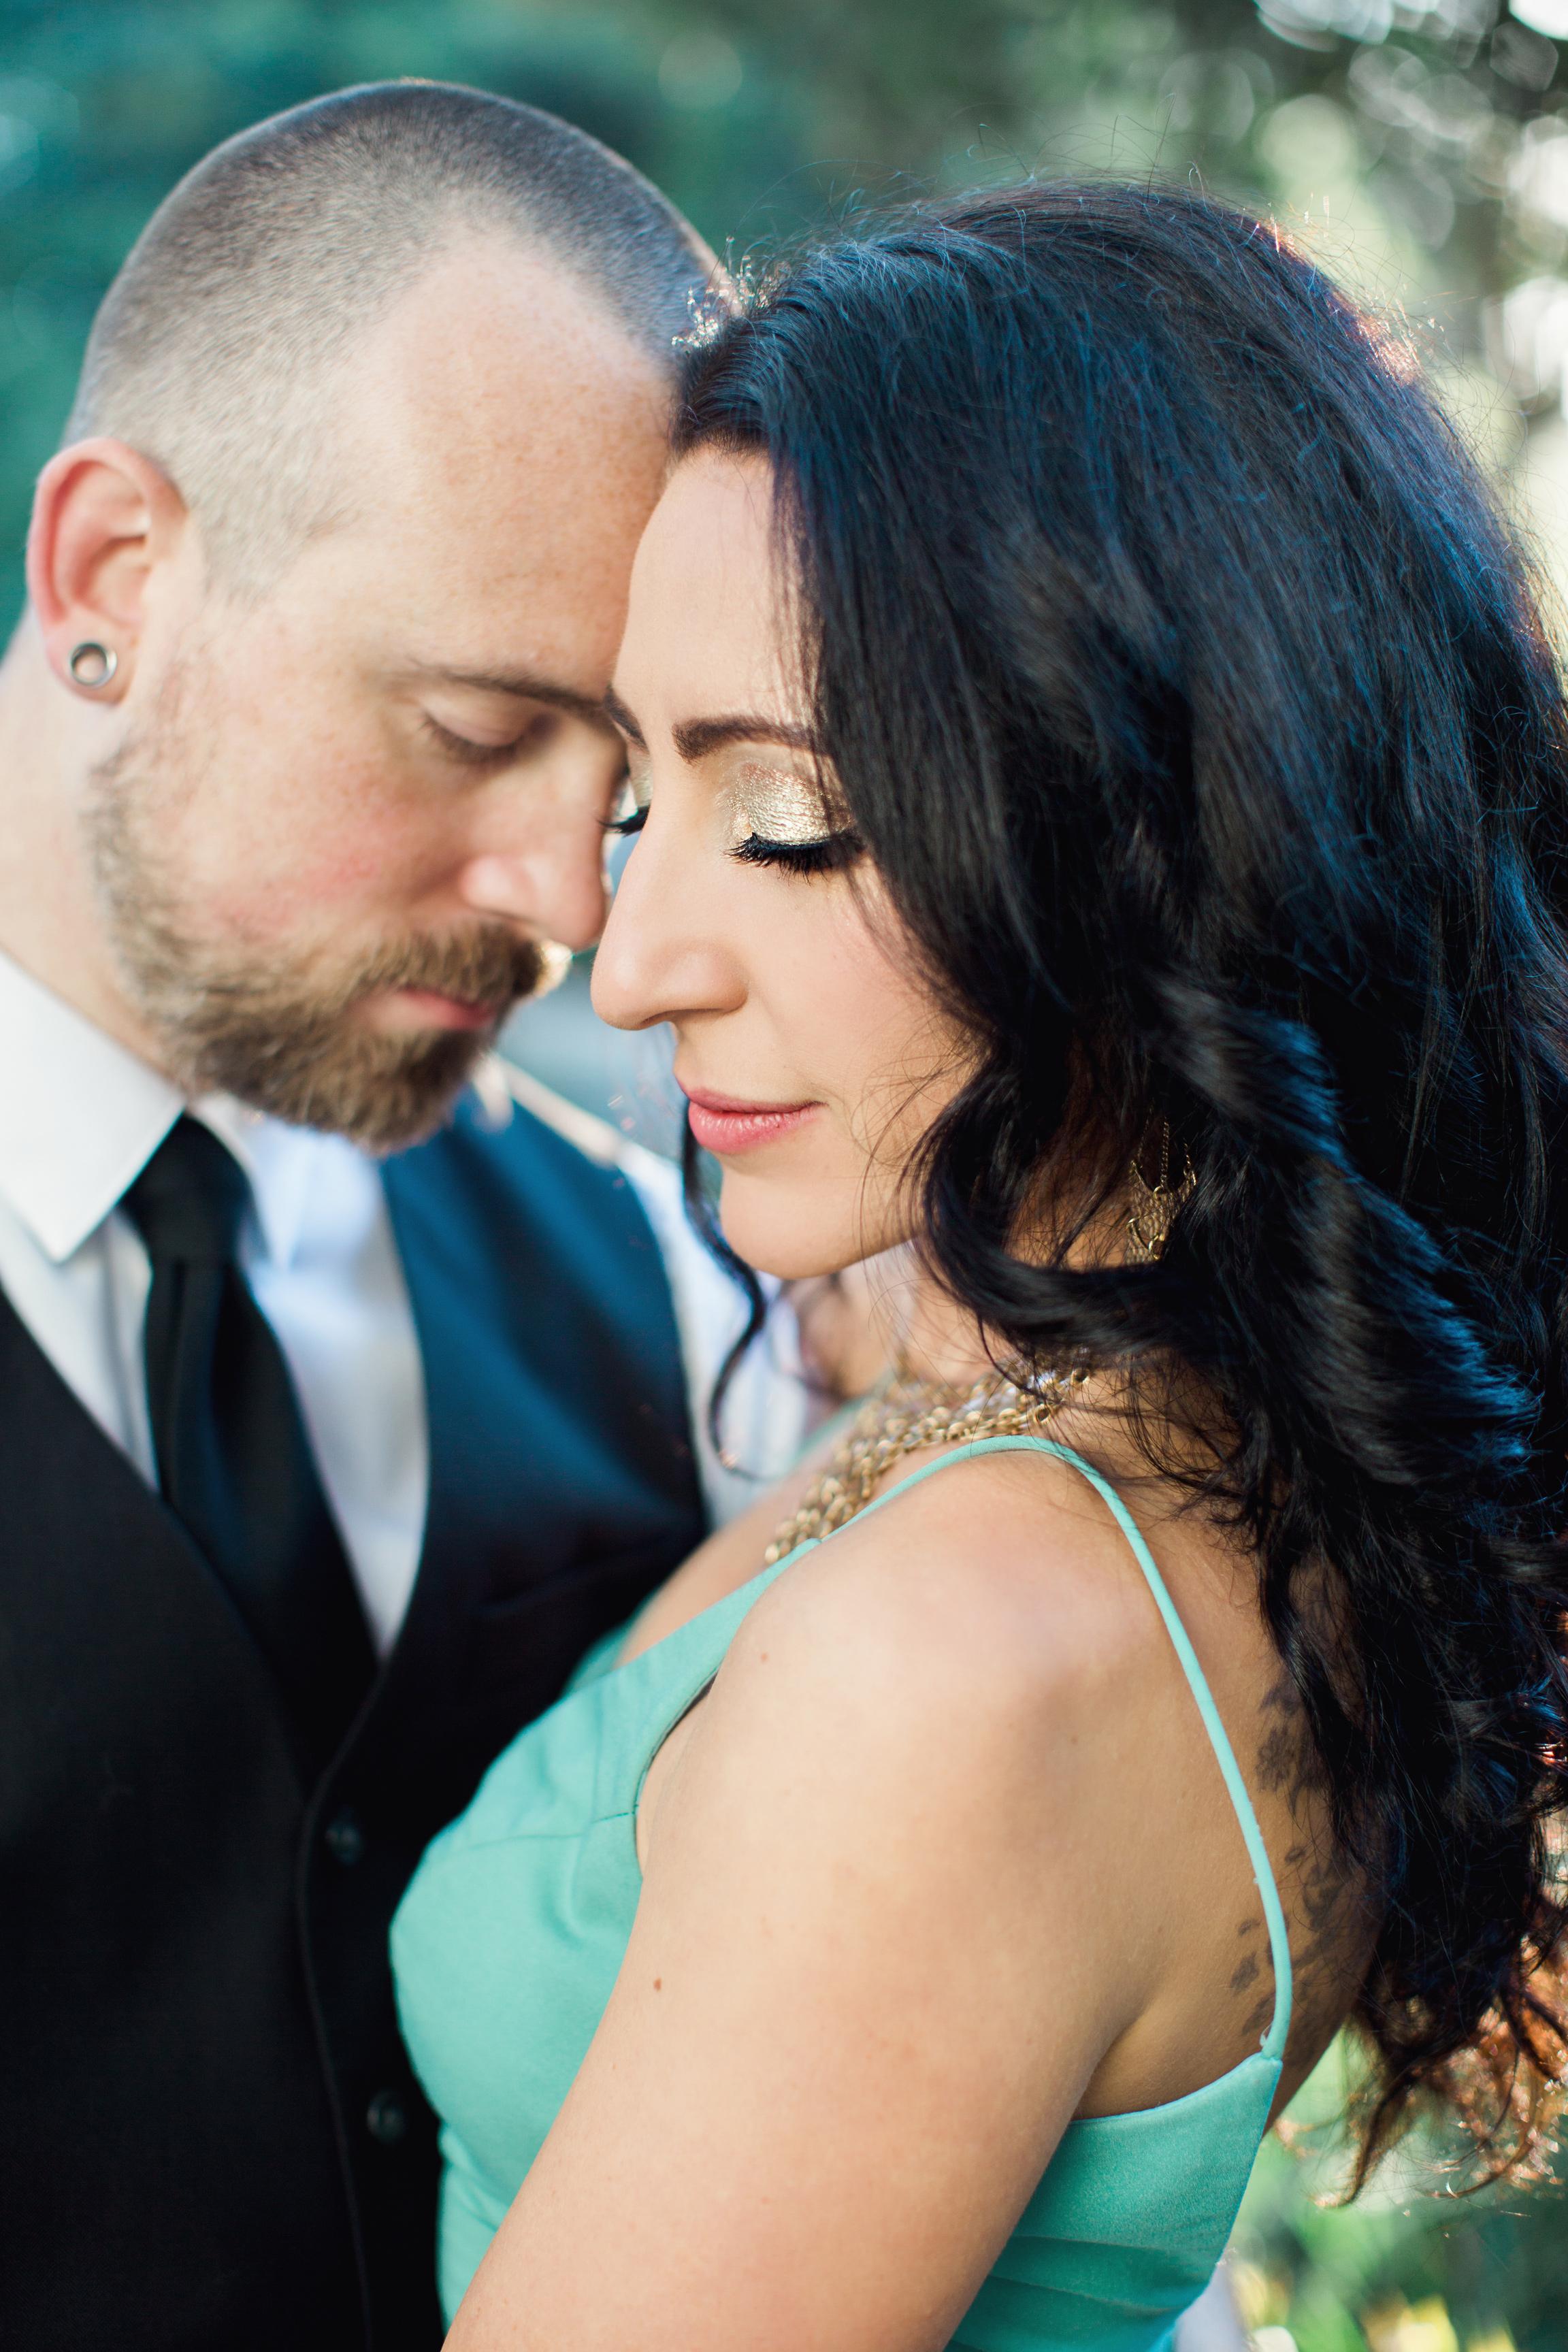 CindyGiovagnoliPhotography_Seattle_Washington_PNW_Couple_Engagement_Portrait_Photography-011.jpg